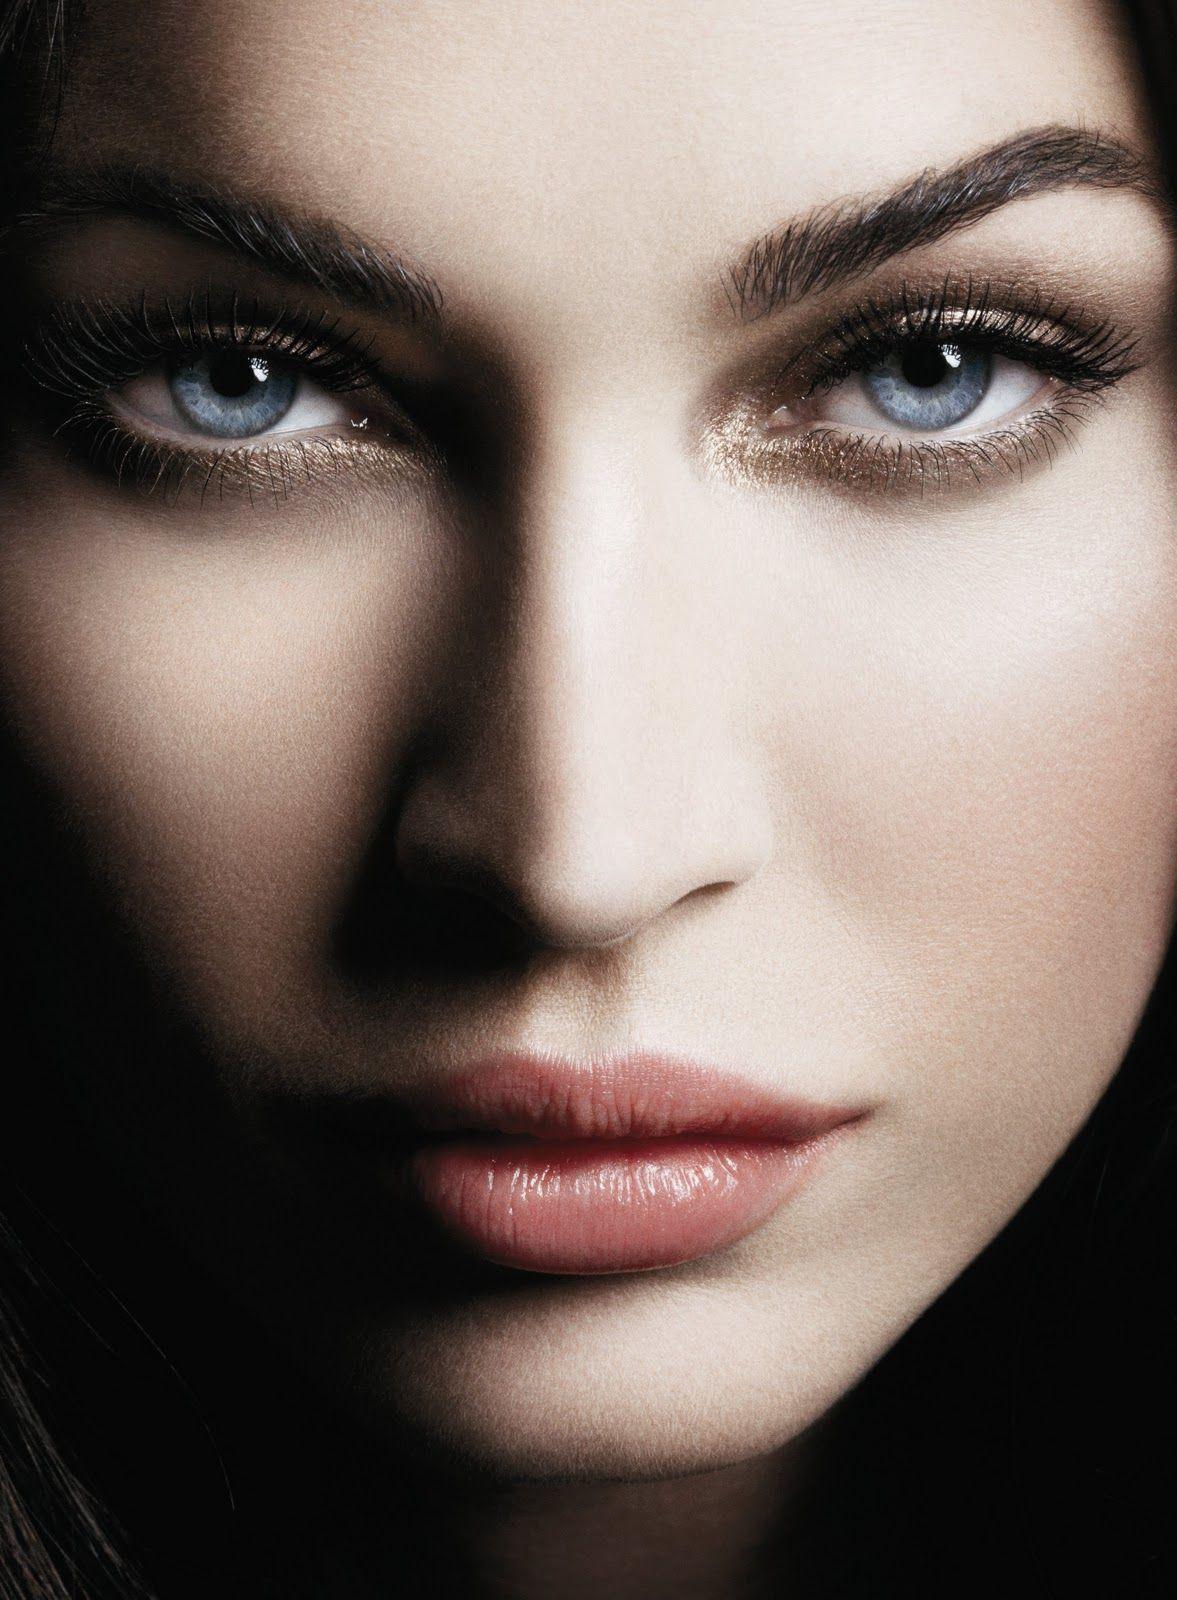 Megan Fox for Armani Beauty, 2011 Beautiful eyes